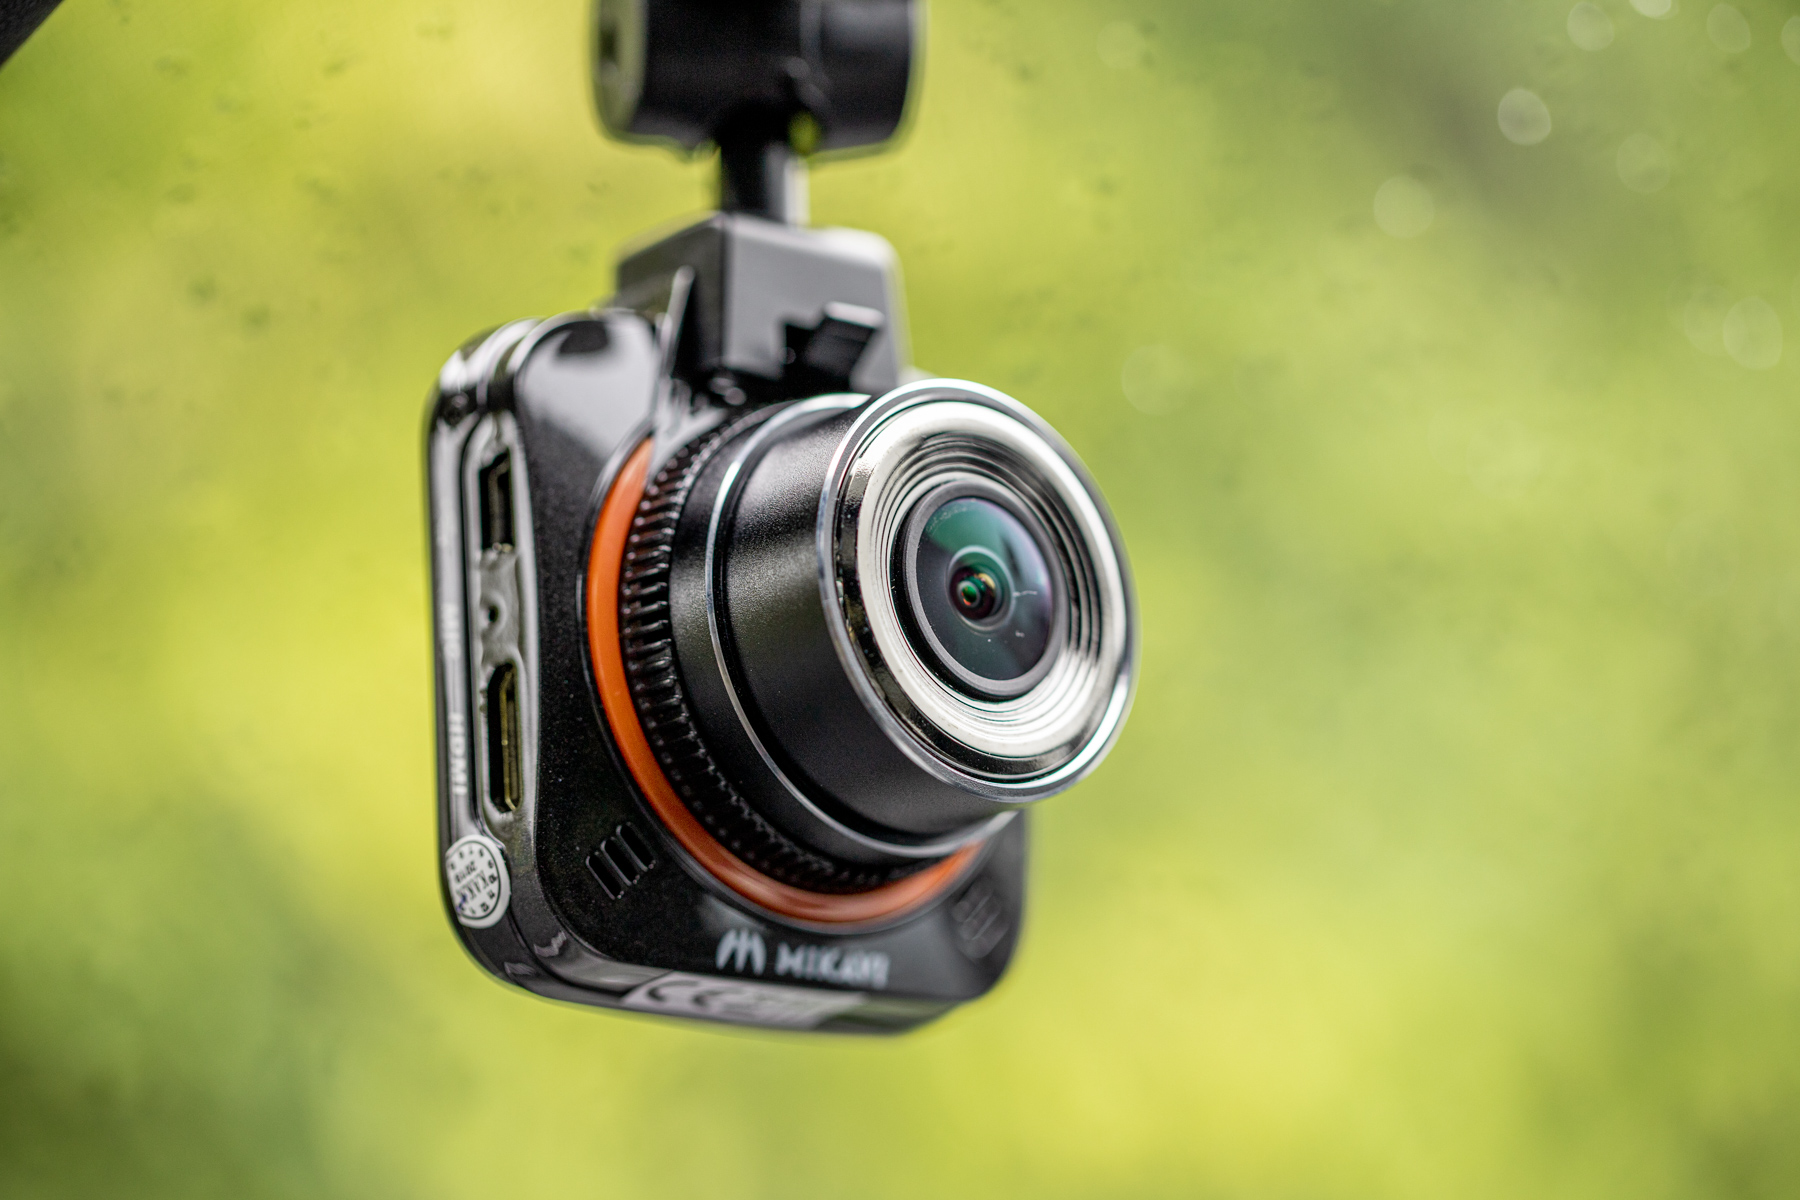 Mikavi wideorejestrator kamera samochodowa (14)